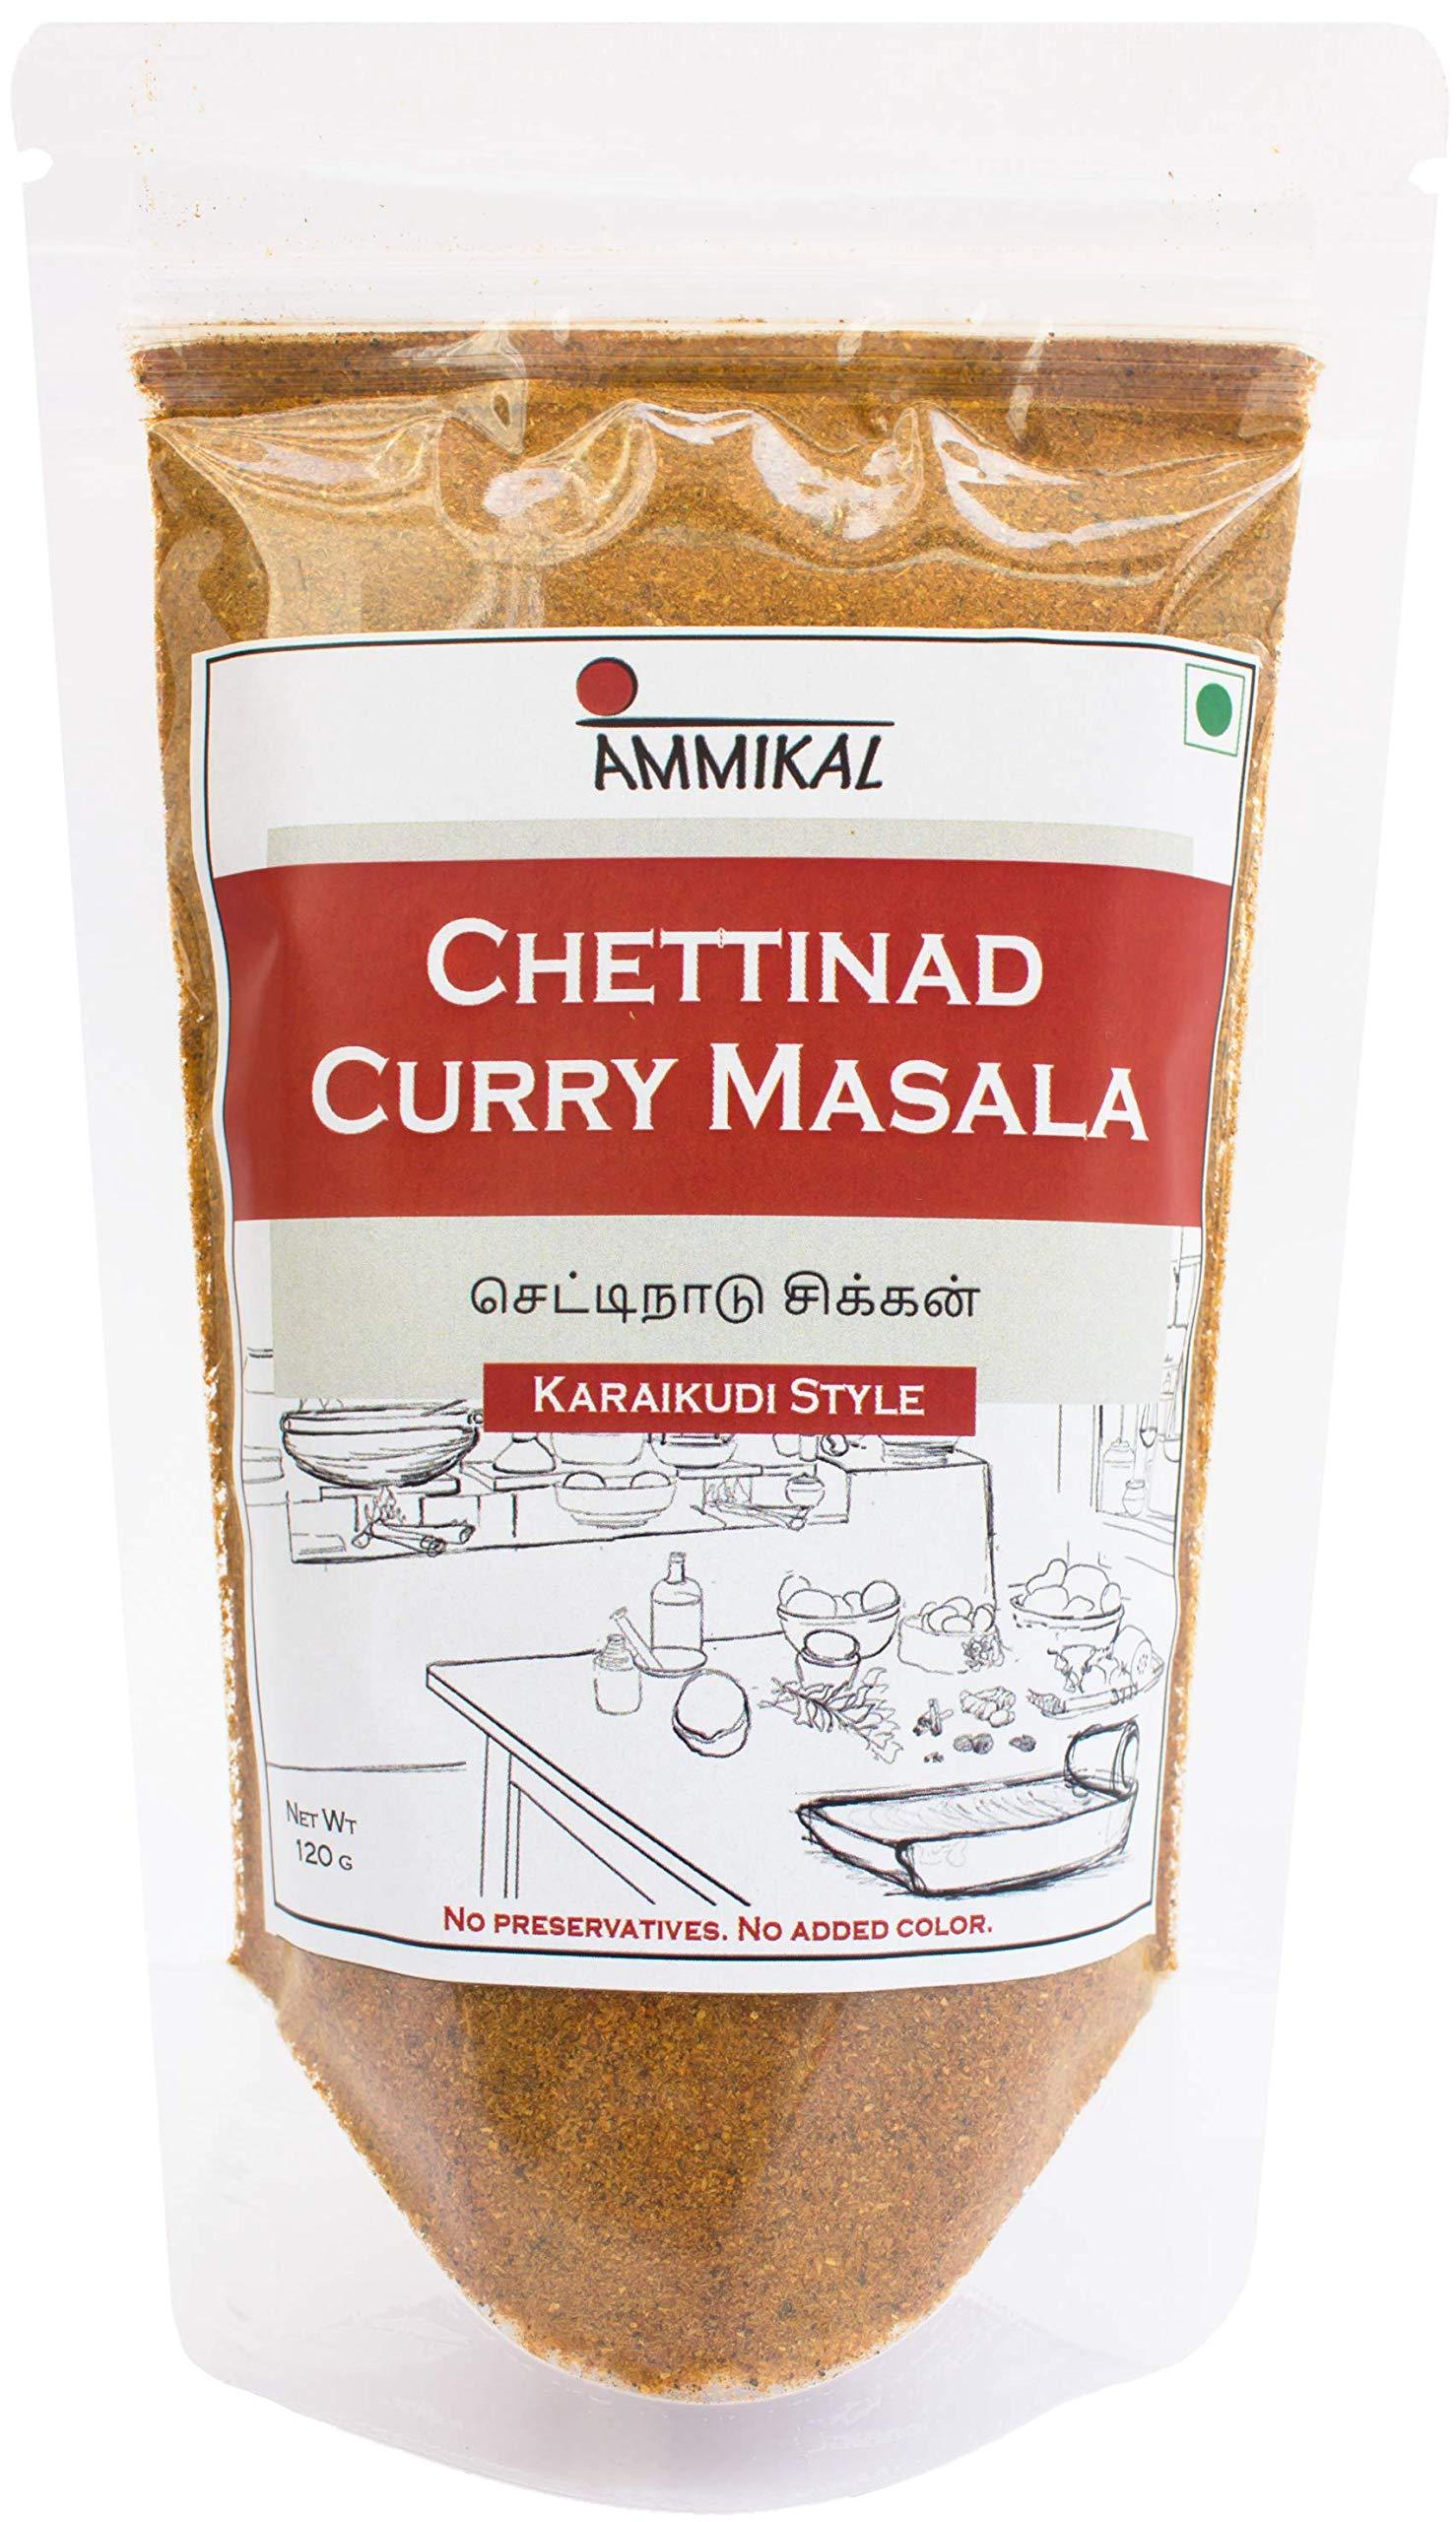 Ammikal Chettinad Masala (120G) | 100% Veg | Use with Chicken, Mutton, Prawns, Paneer, Yam and More